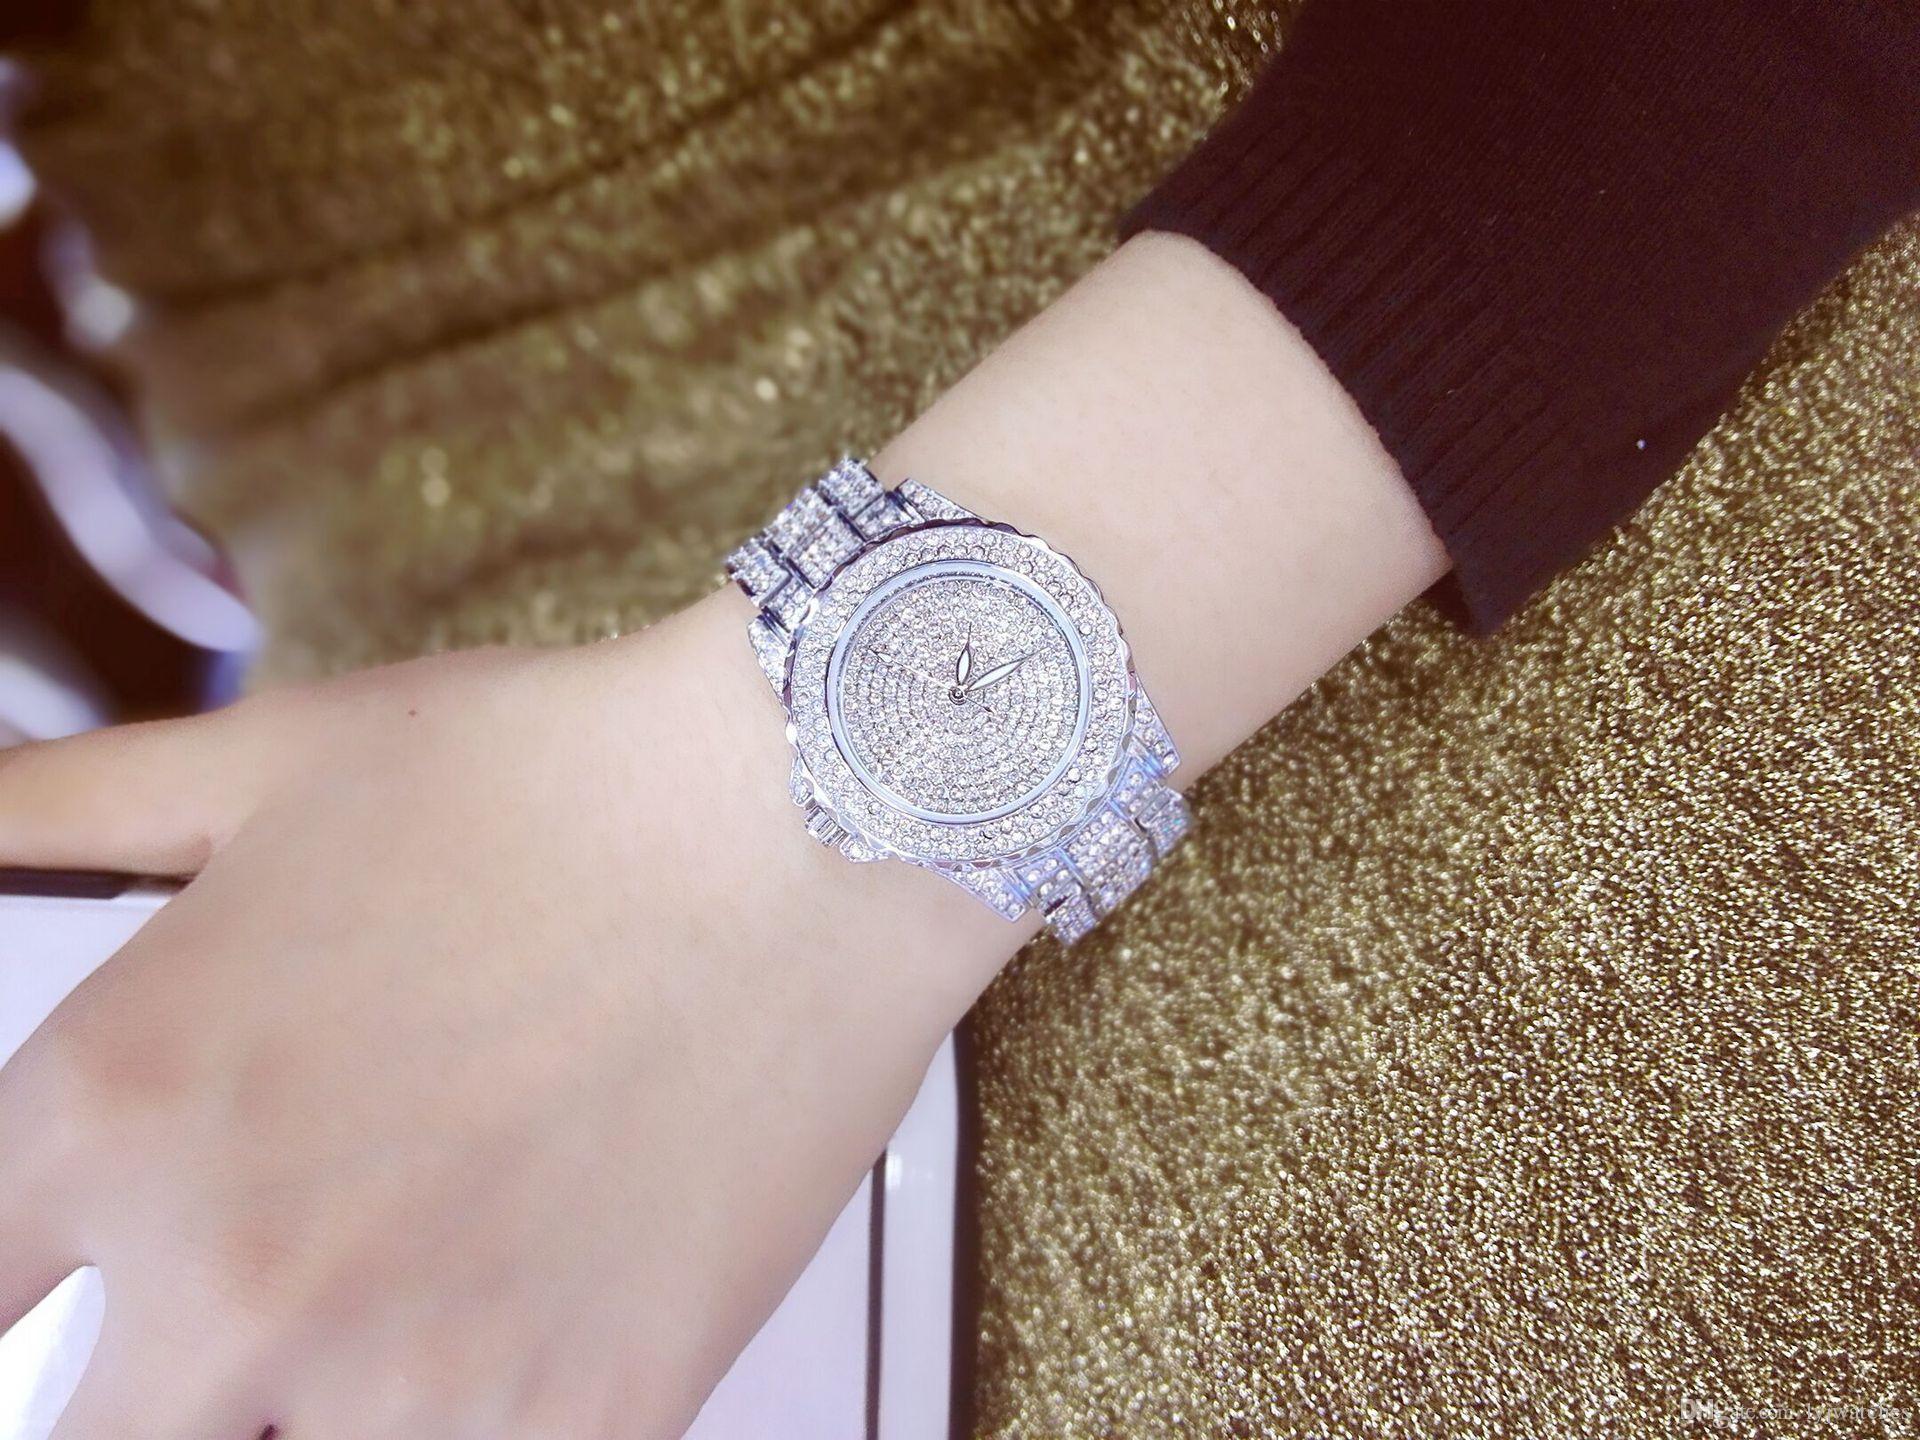 Fashion Korean waterproof full drilled Diamond Crystal Watch Diamond Watches gifts